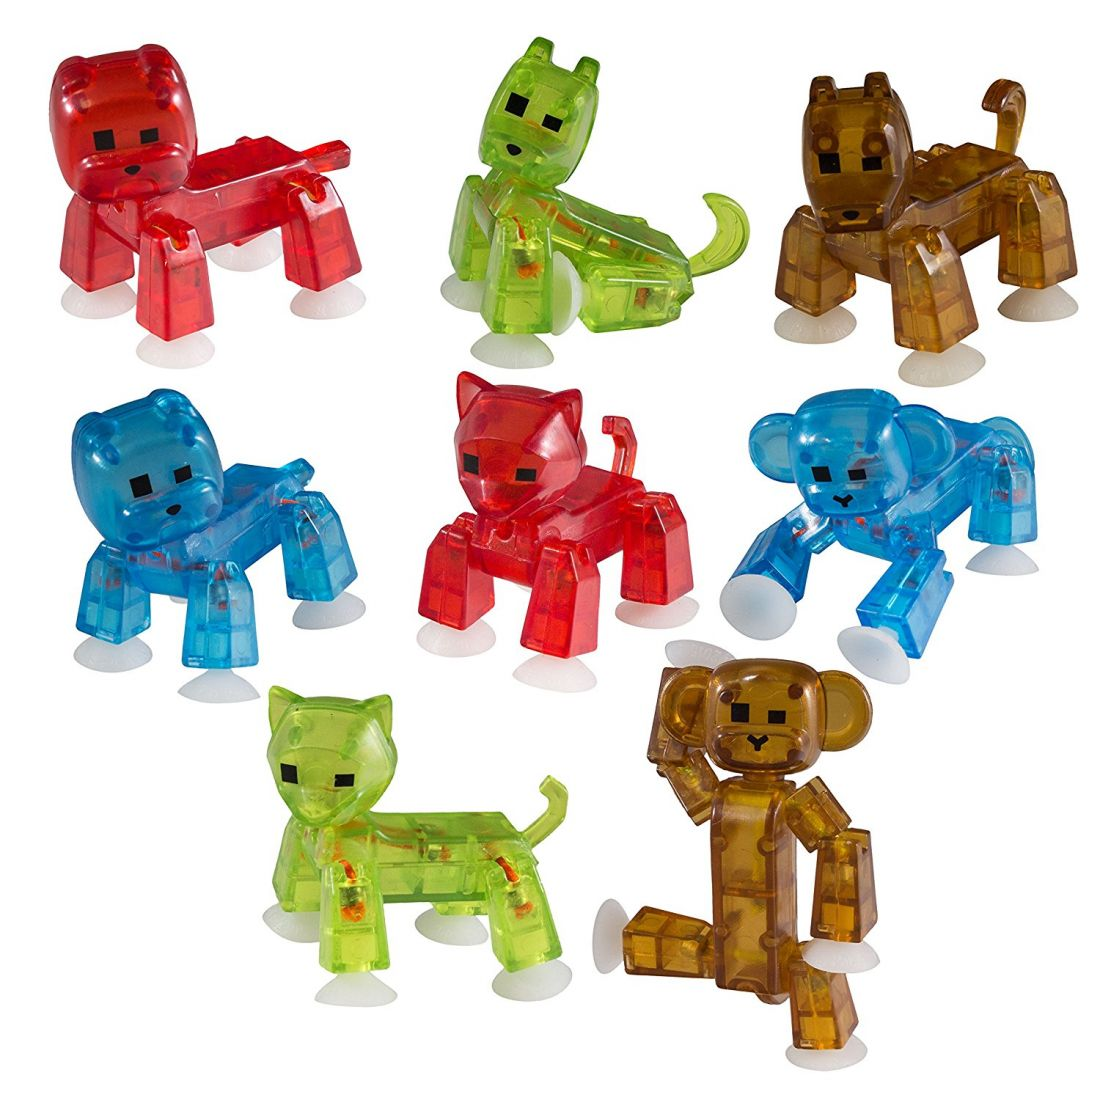 Мега набор Стикбот животные Stikbot Pets